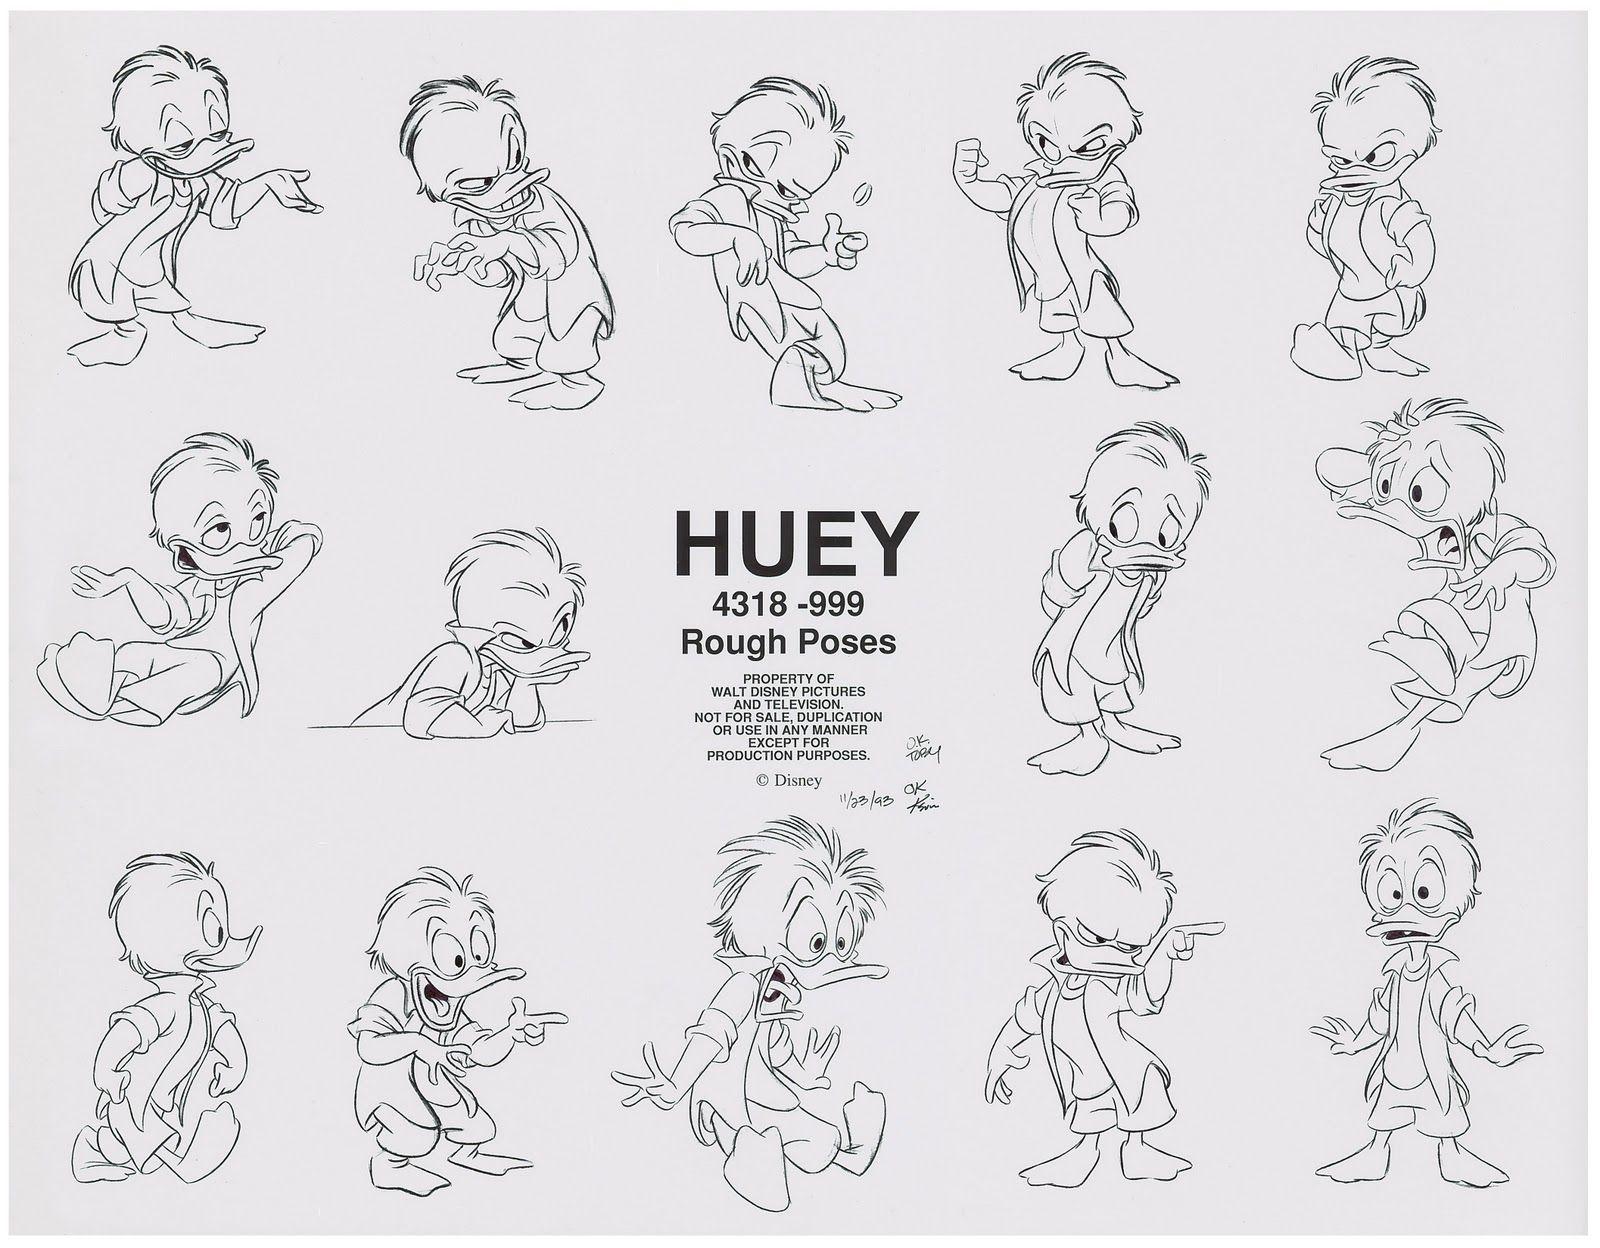 Toby Shelton Stuff I Did Huey Dewey Amp Louie Model